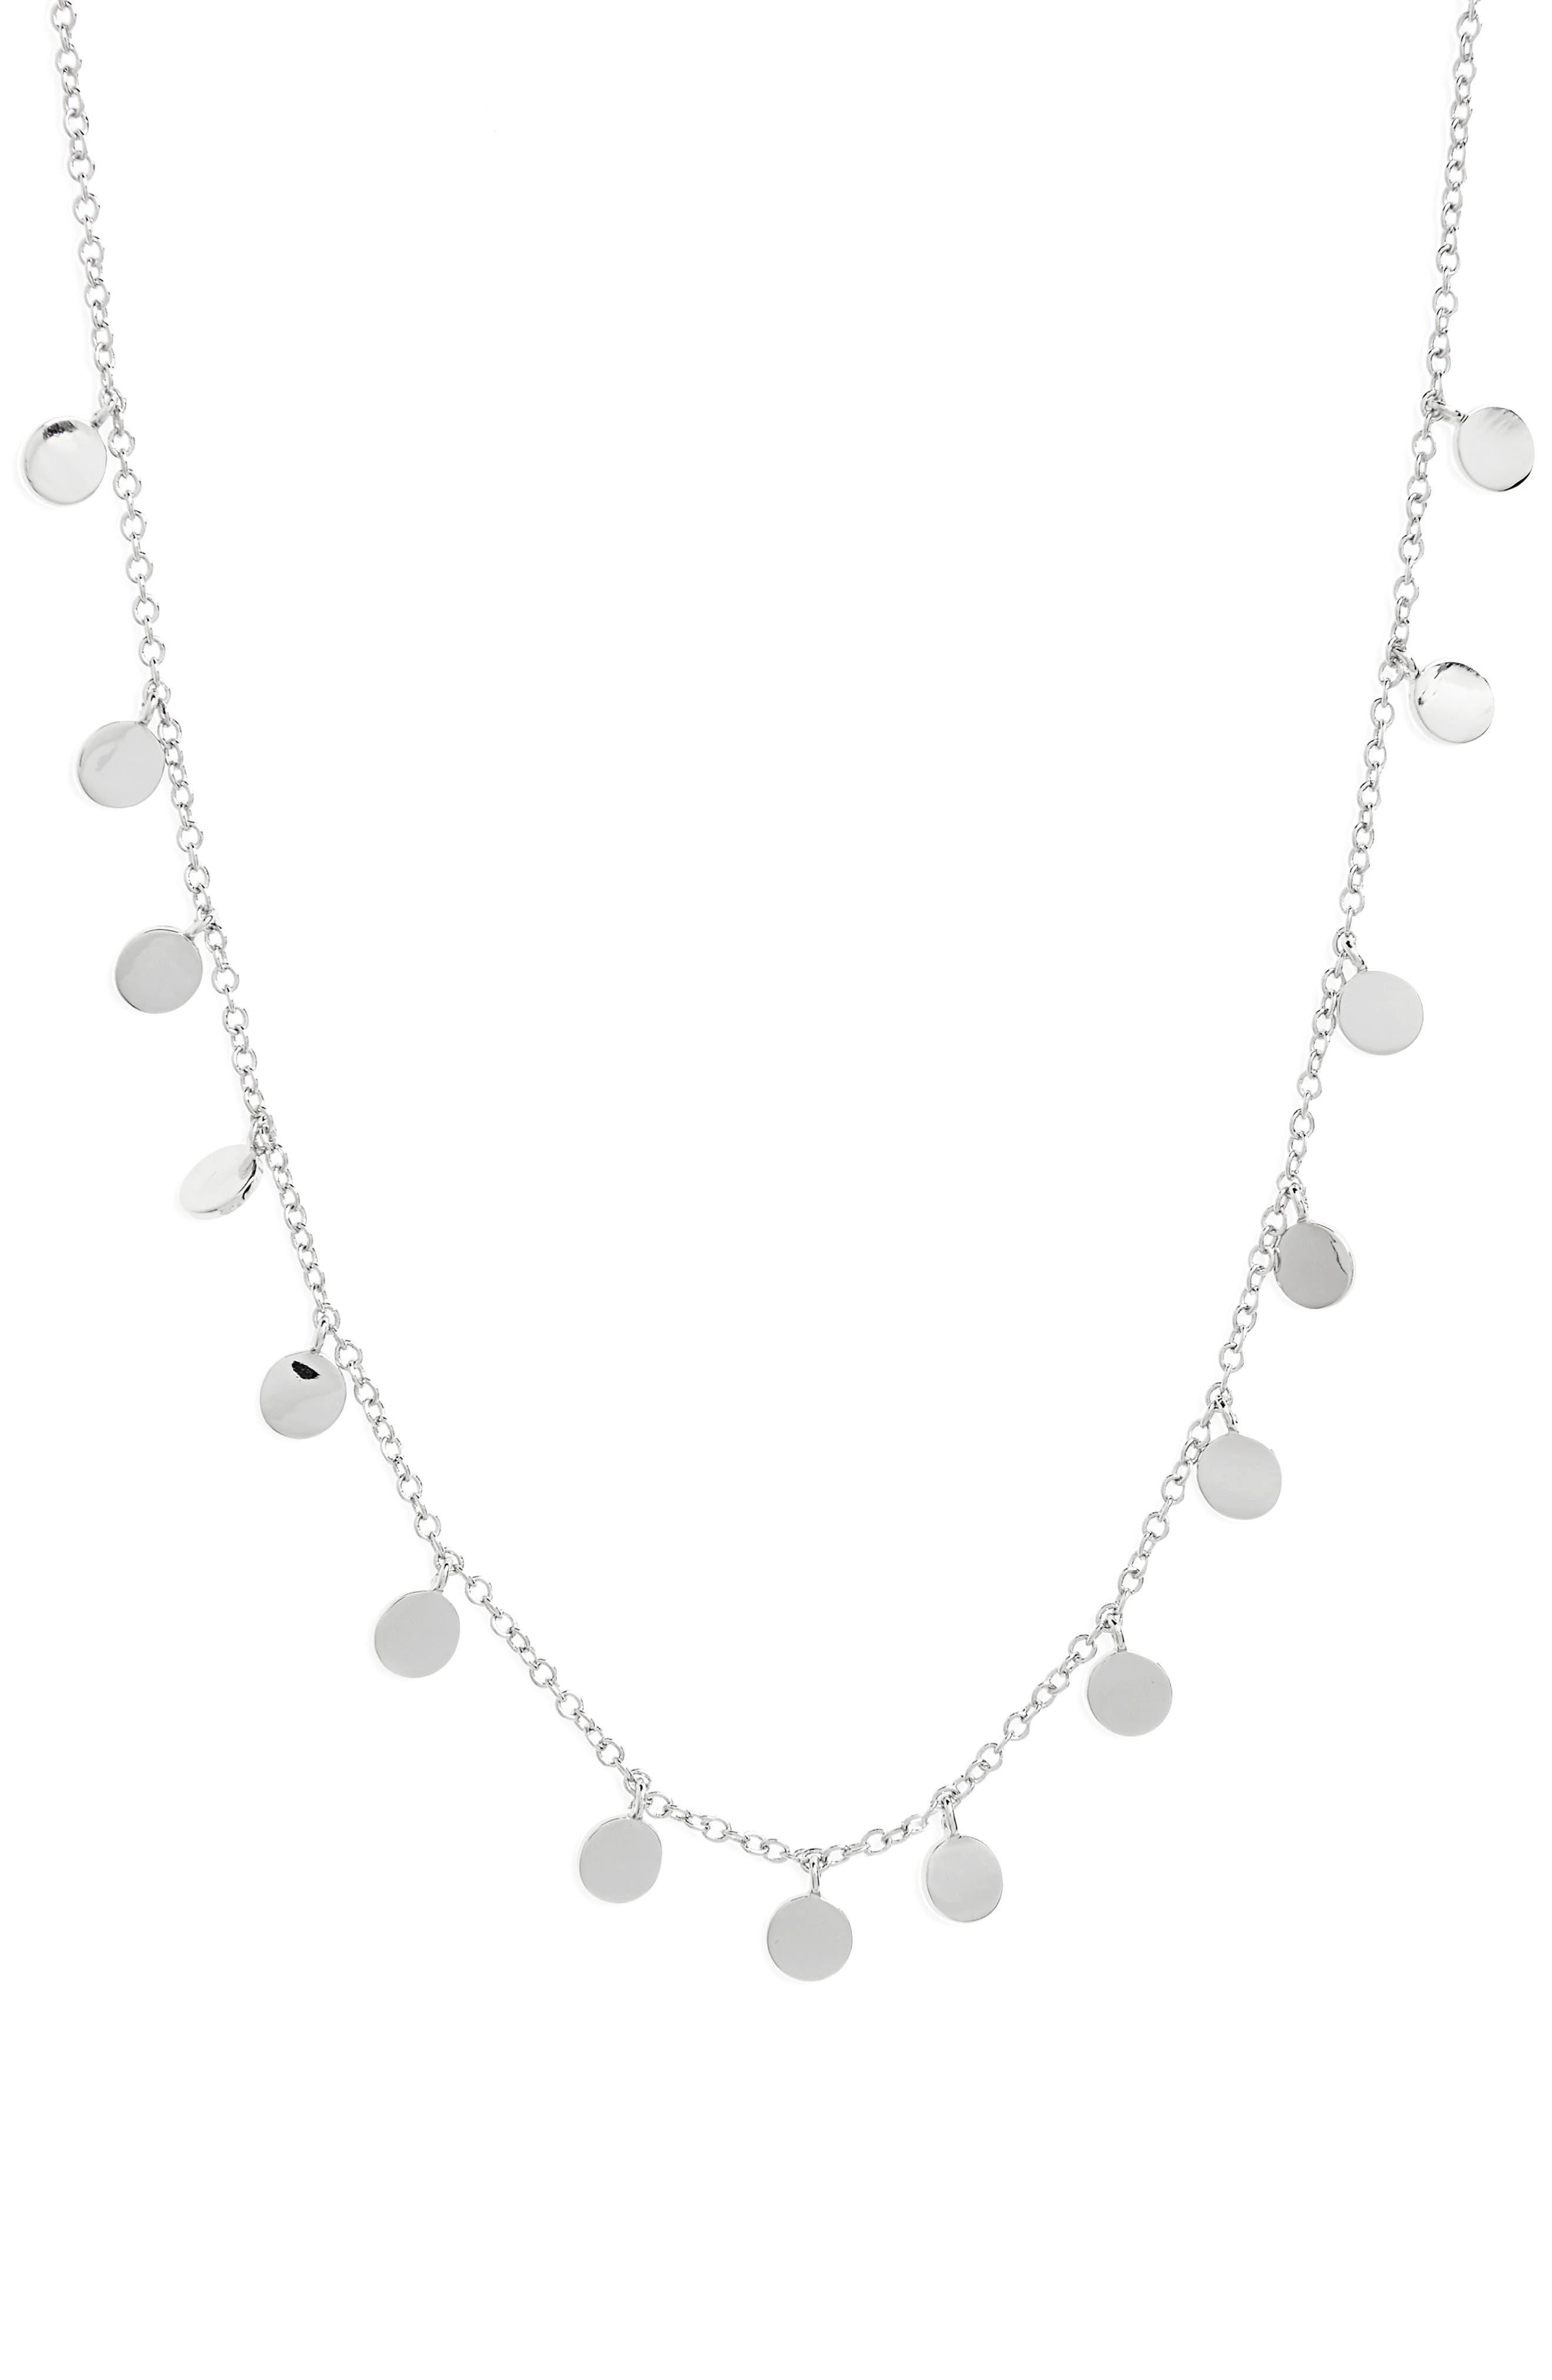 Main Image - Melanie Auld Mini Disc Collar Necklace